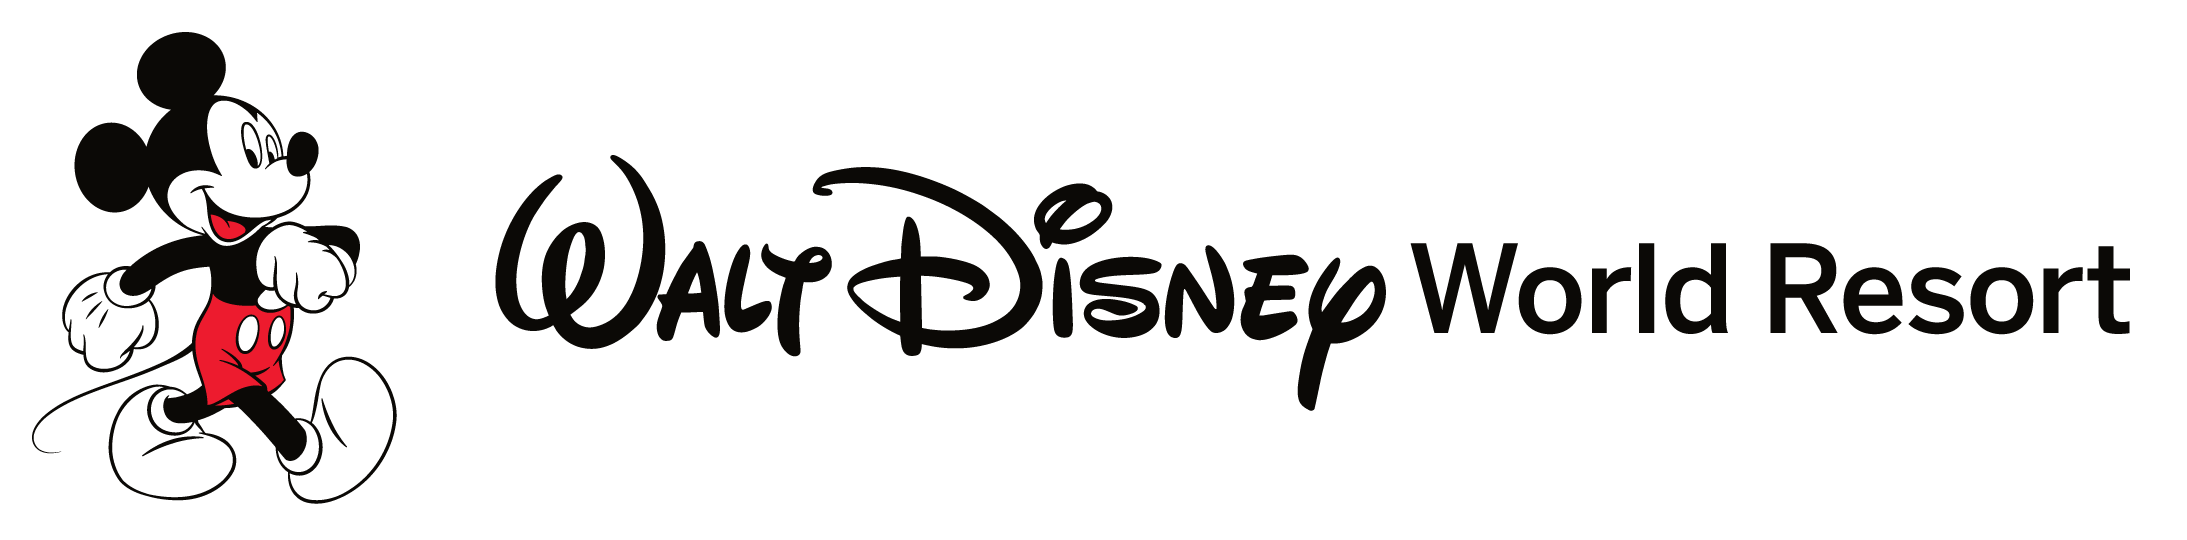 Walking mickey walt disney world resort logo 02 clipart kid